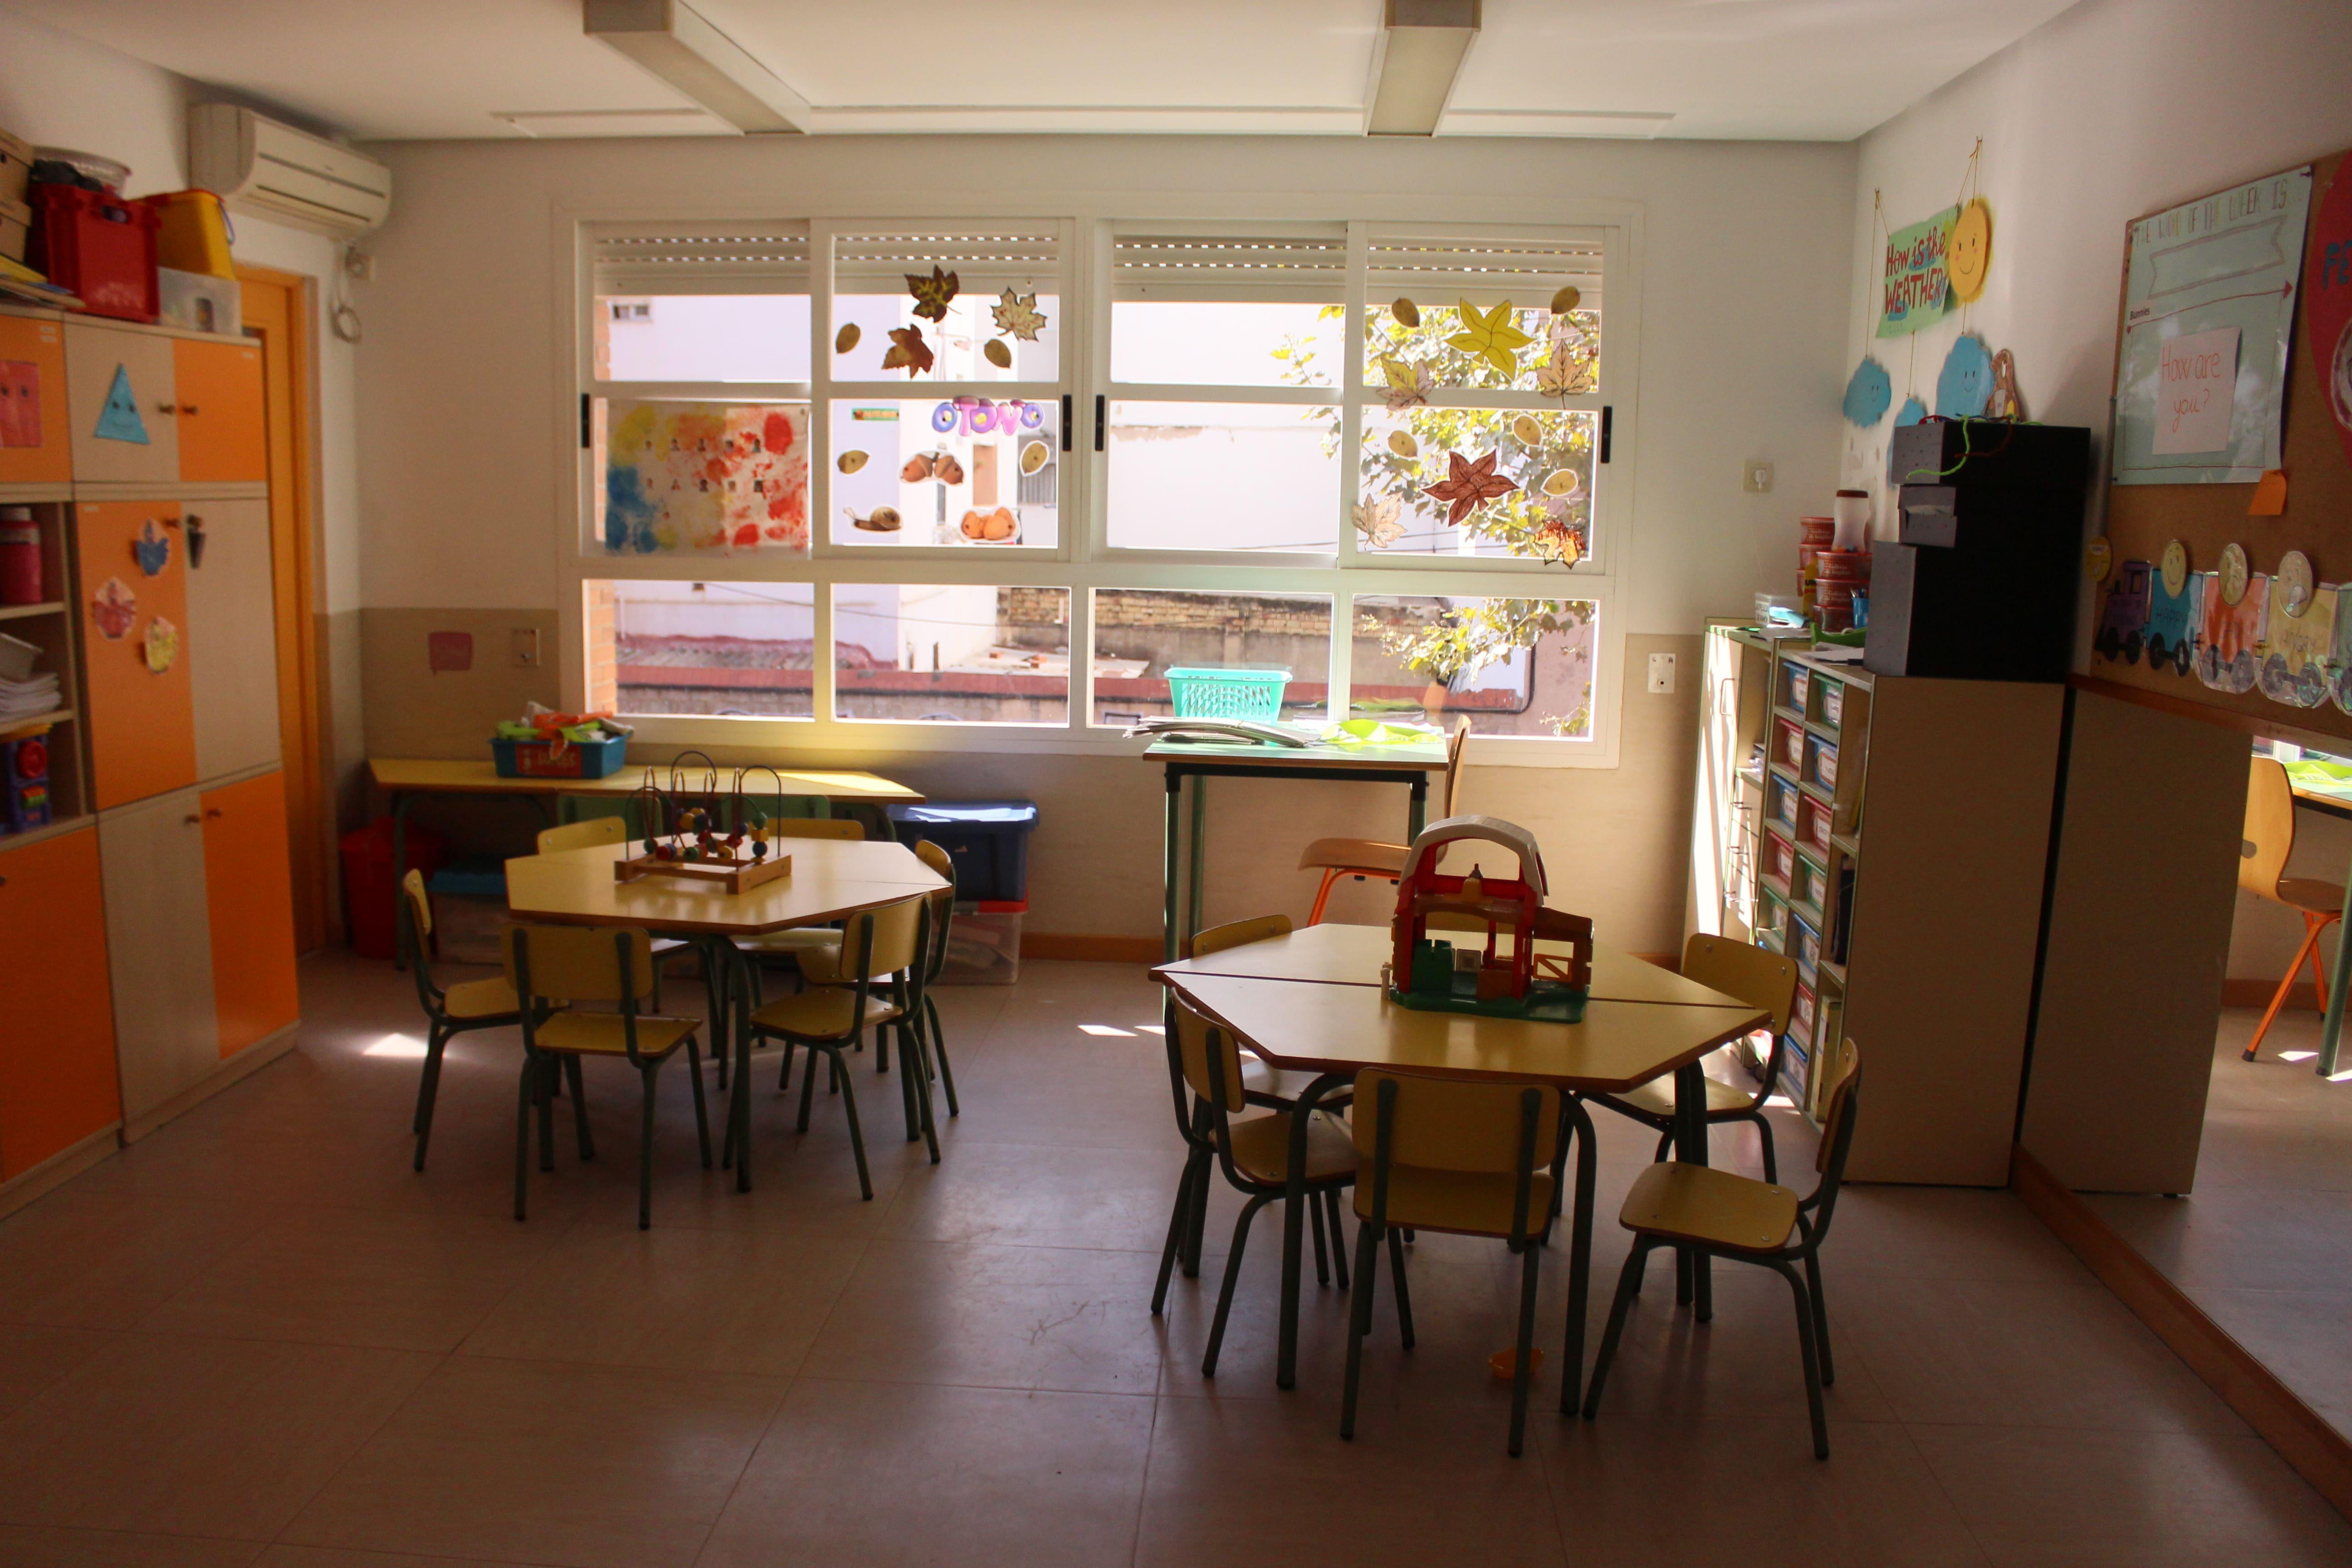 escuela infantil bilingüe en Valencia - clase infantil